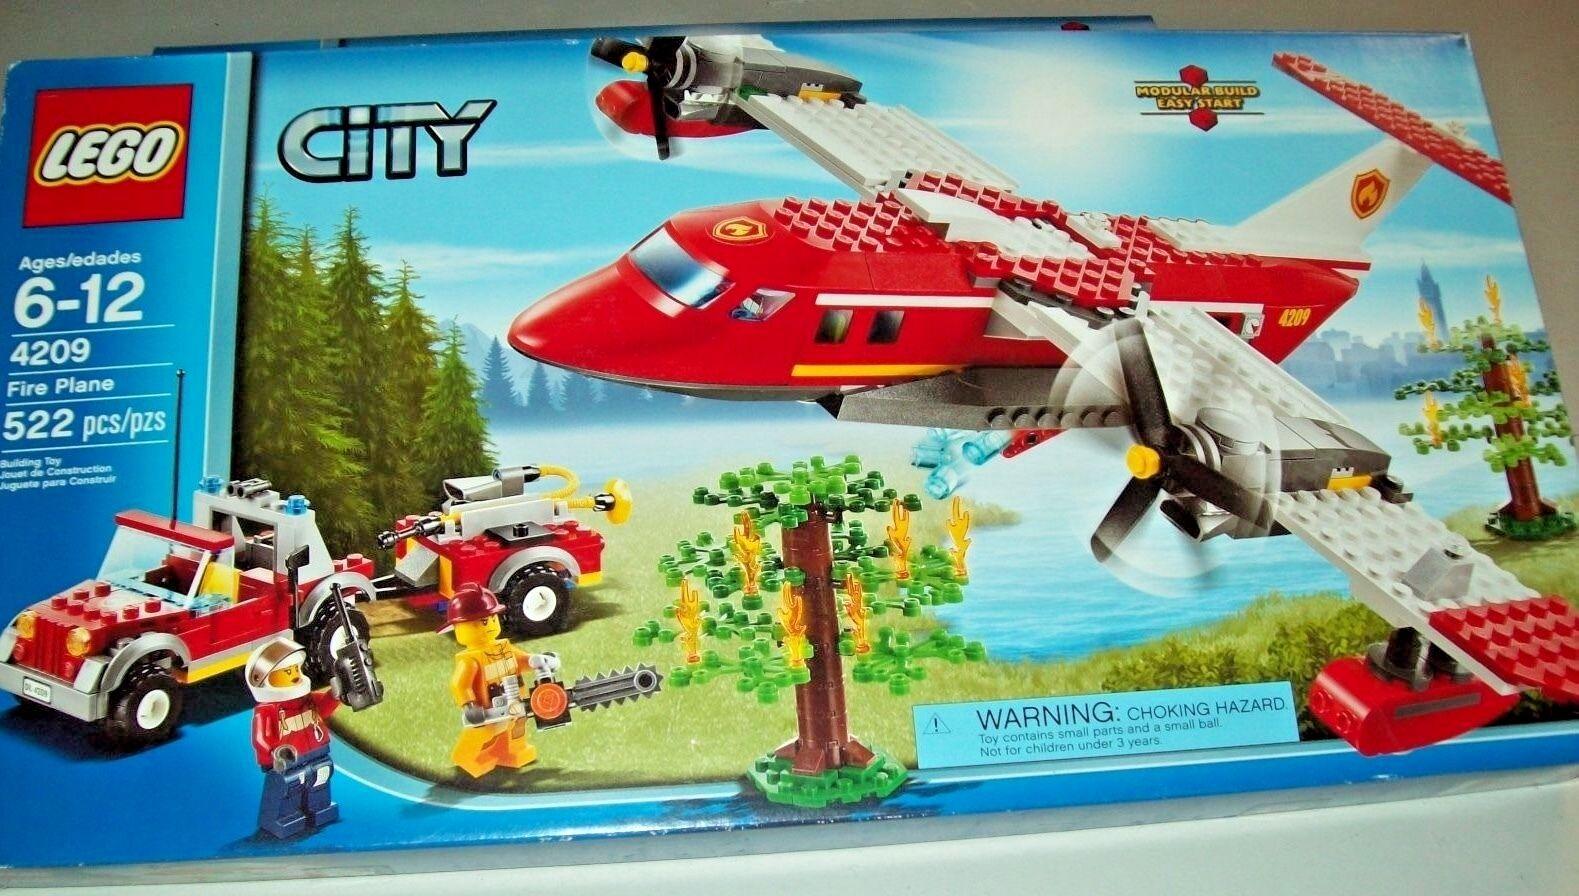 LEGO 4209 City Fire Plane  - RETIROT SEALED 522 pcs